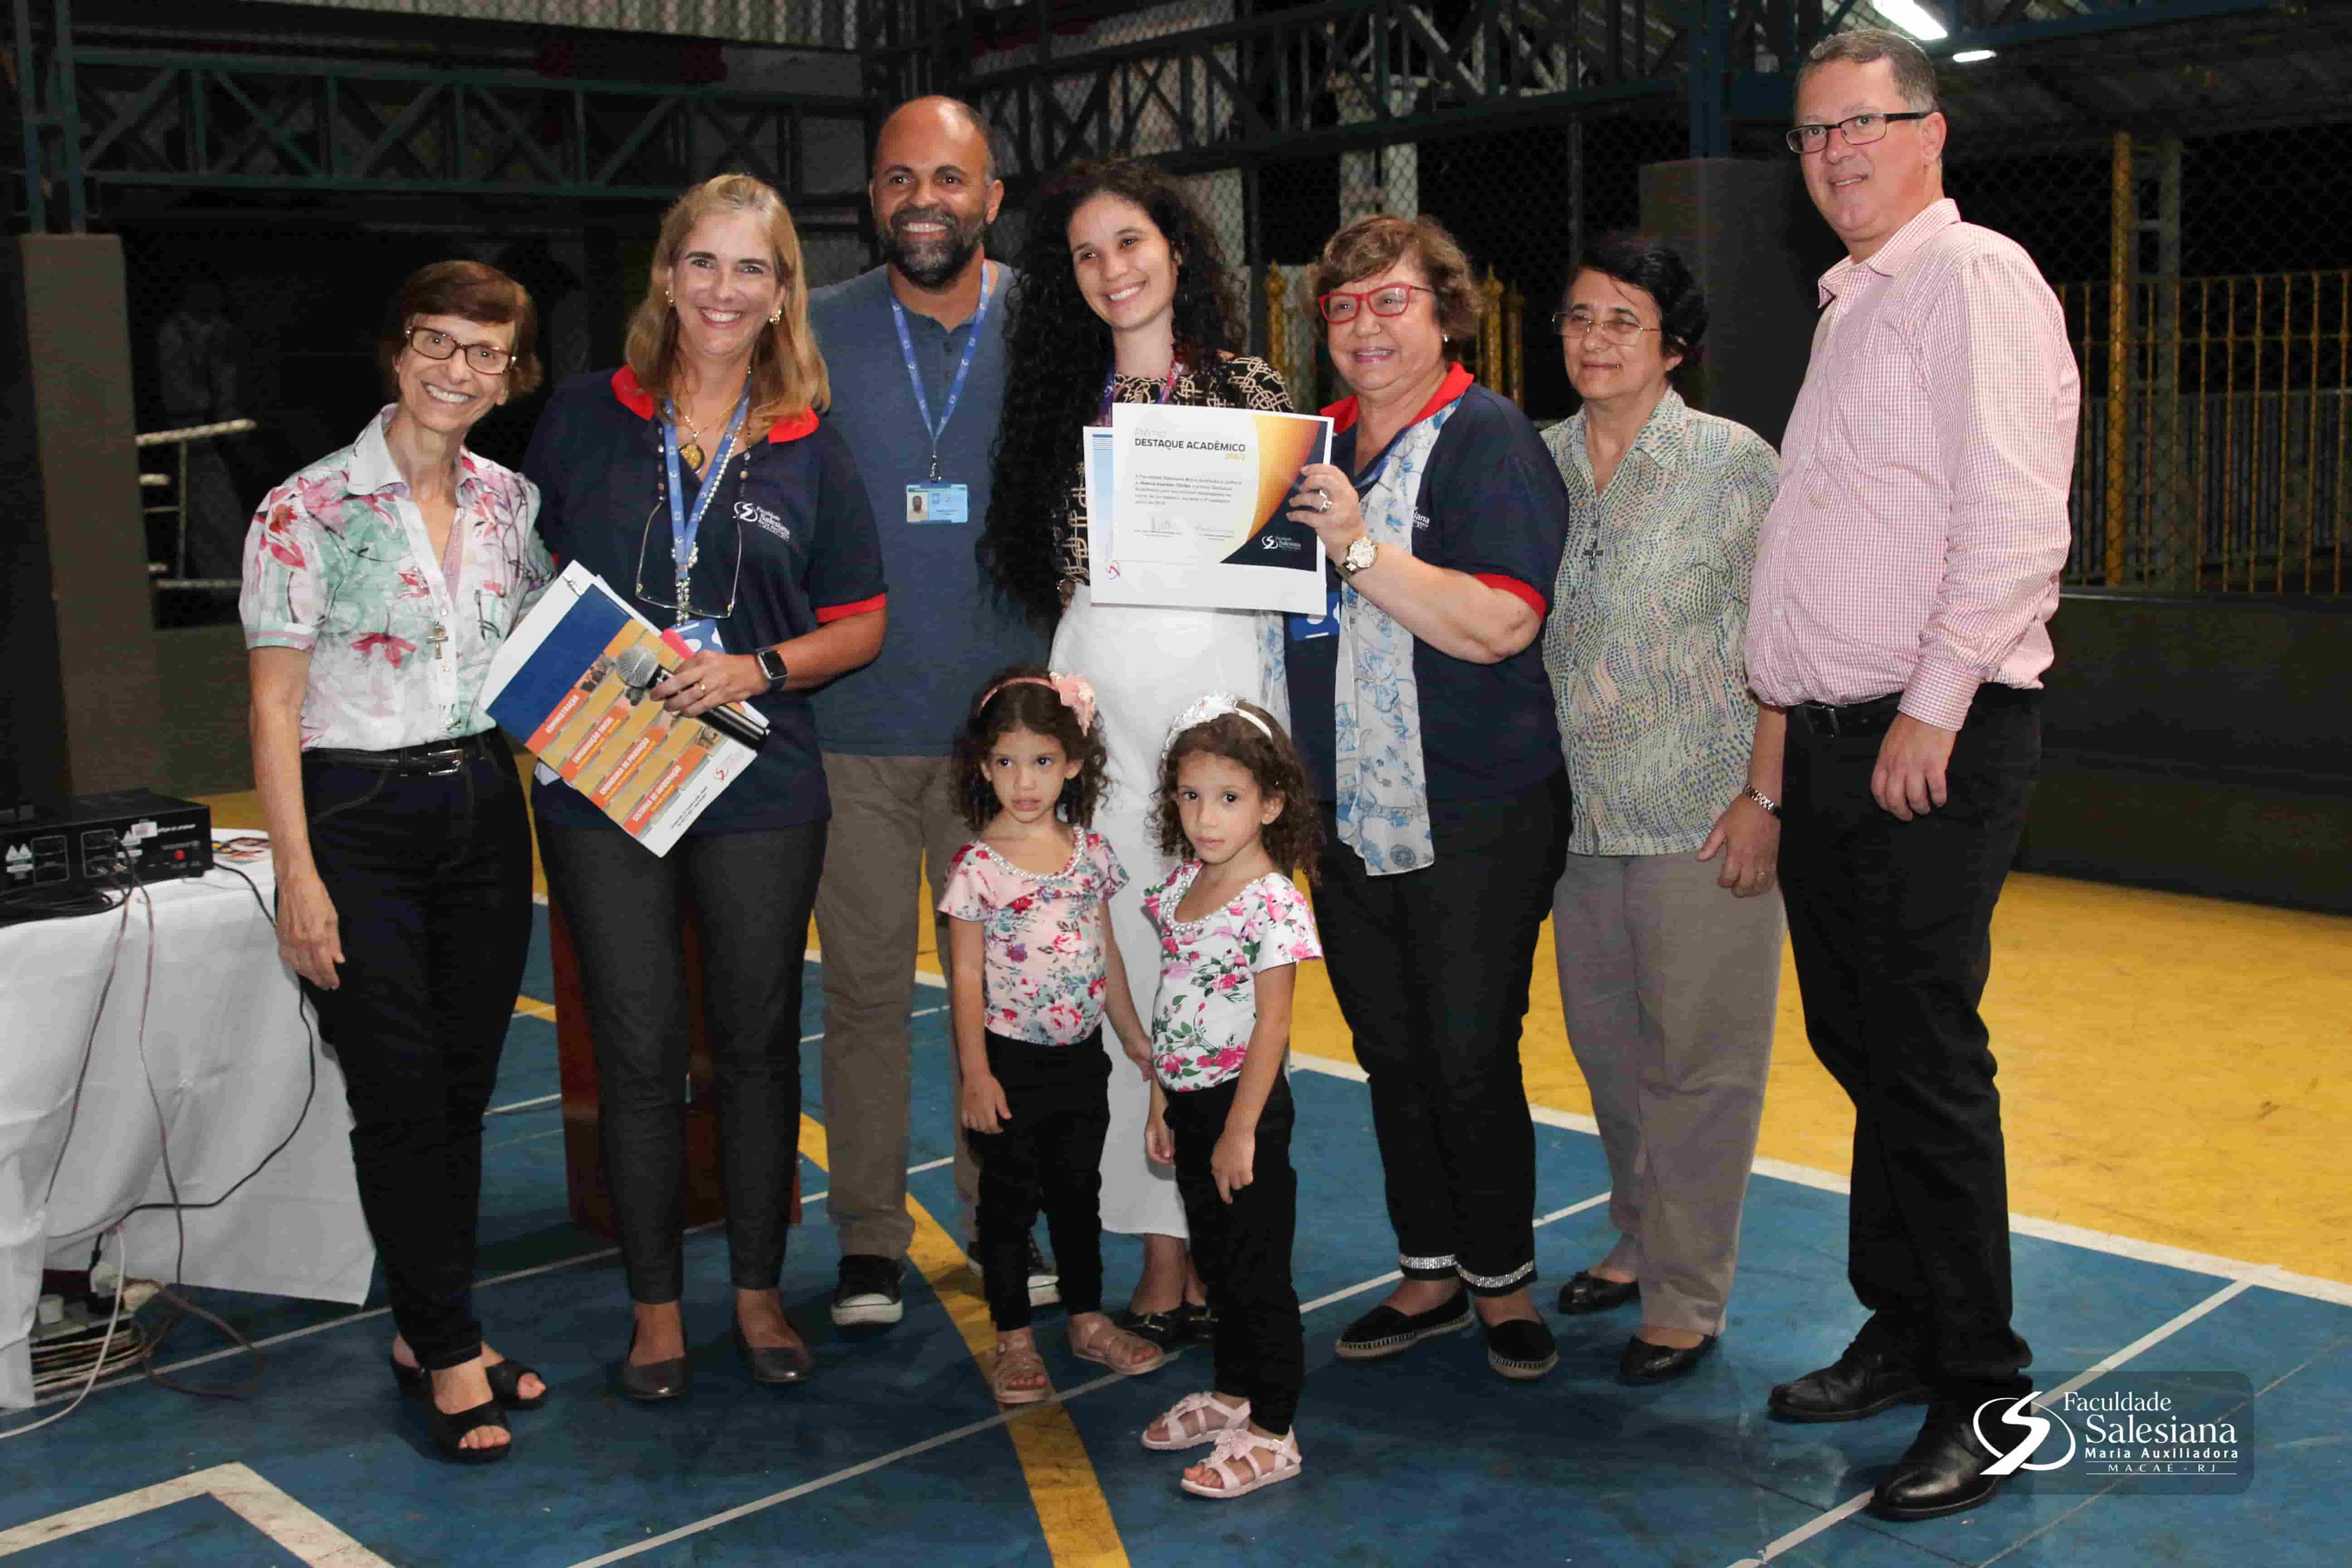 FSMA realiza entrega do Prêmio Destaque Acadêmico